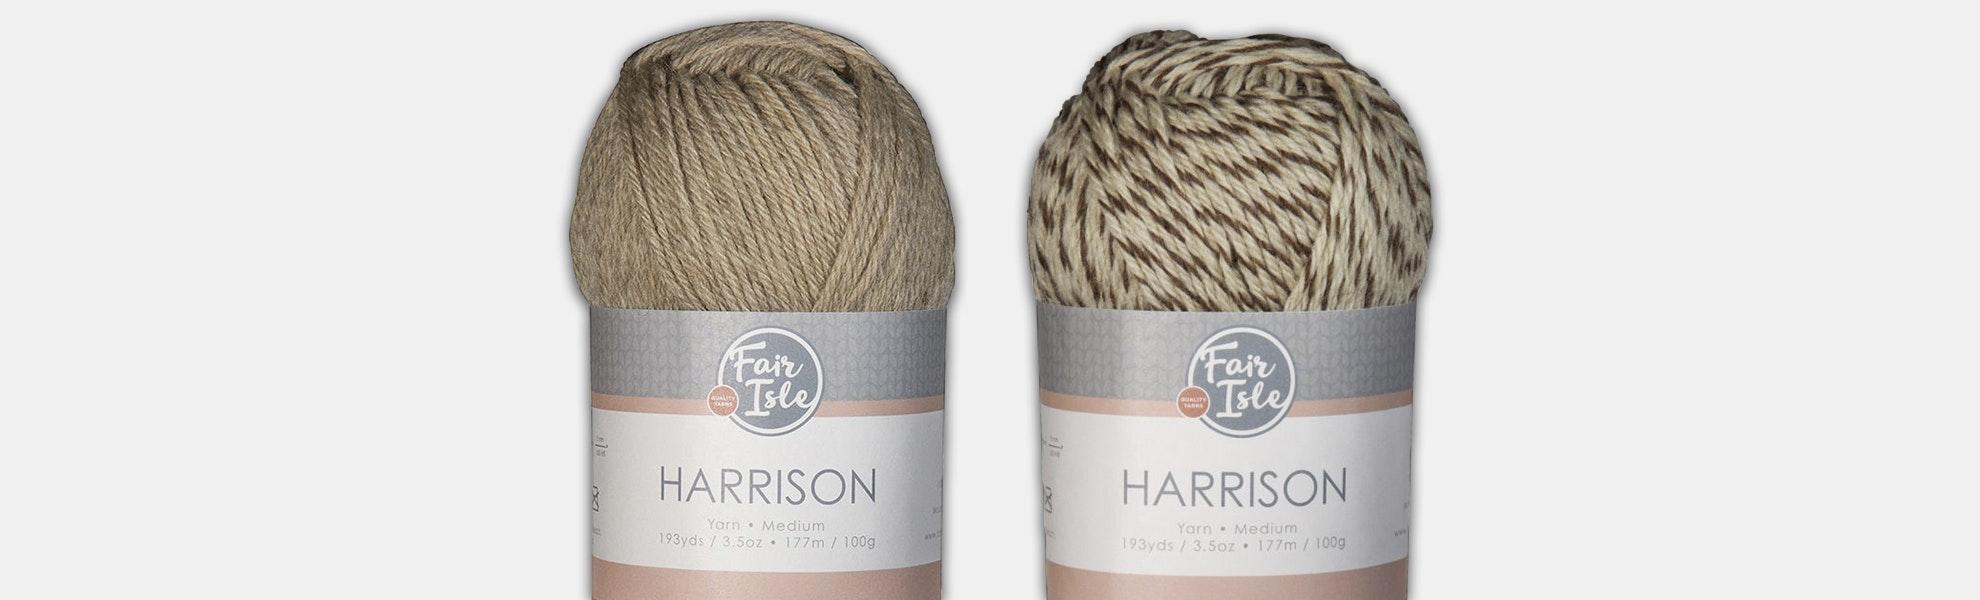 Harrison Yarn by Fair Isle (2-Pack)